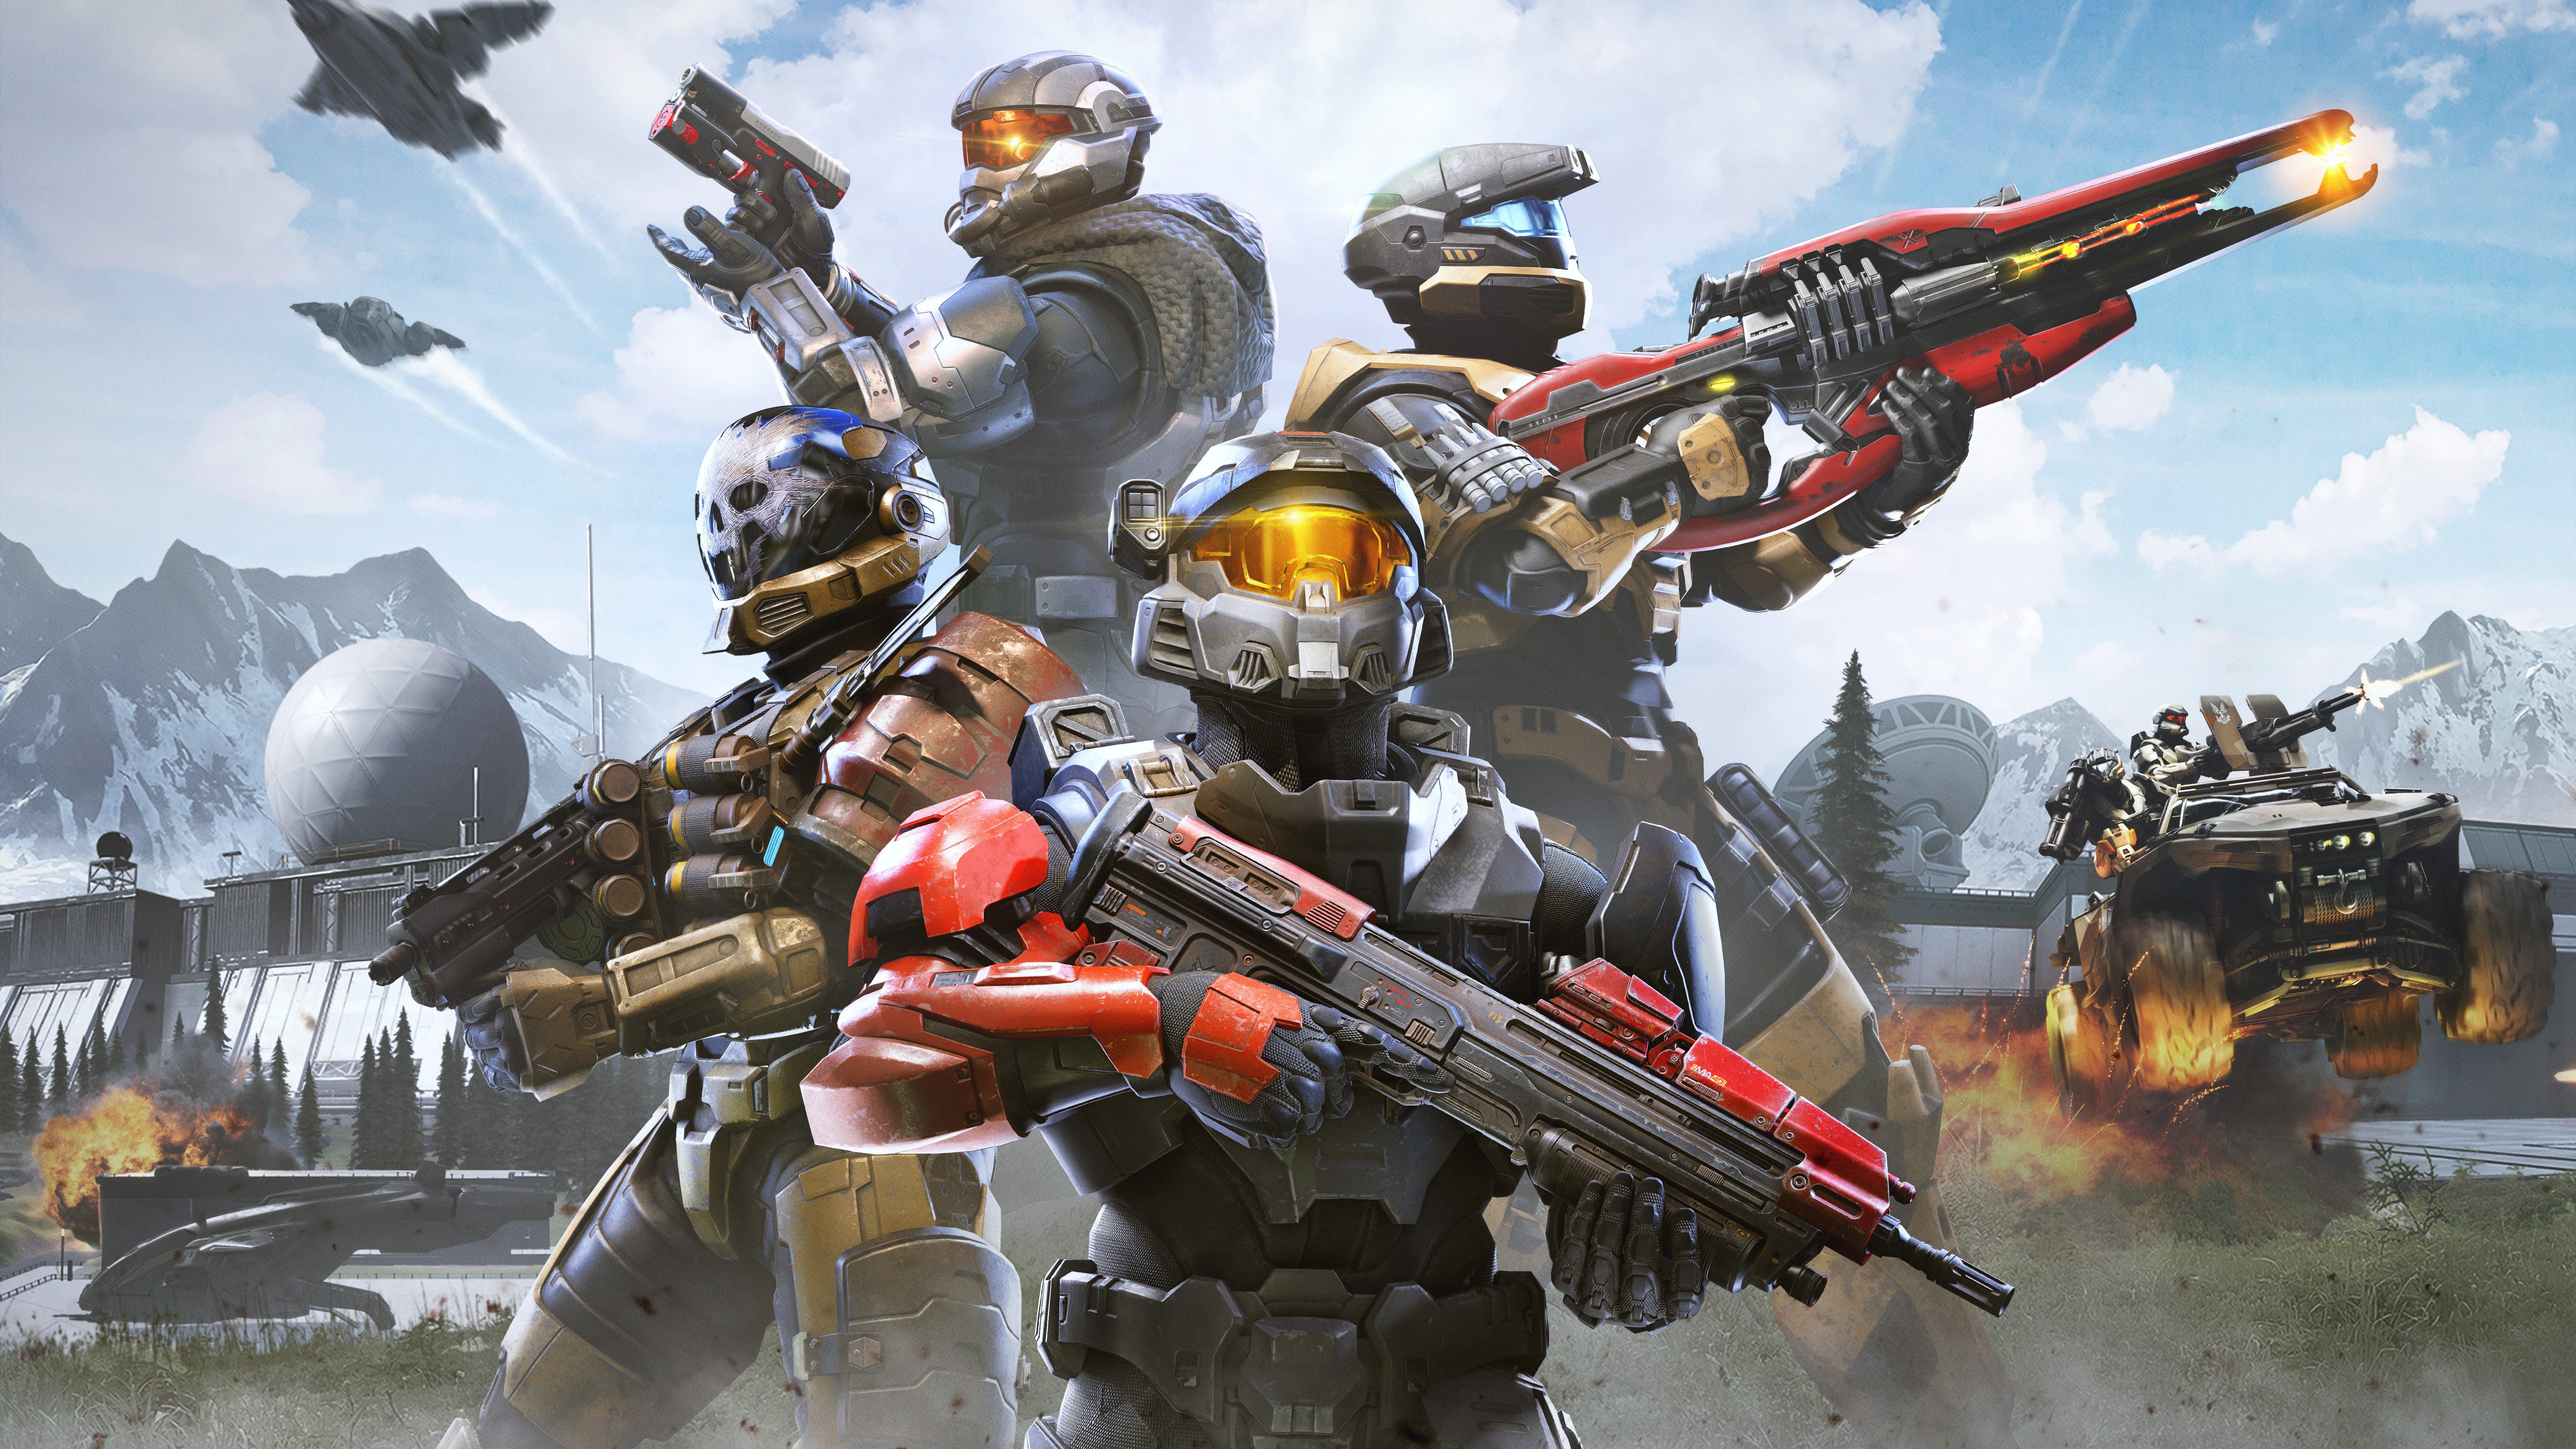 Wallpaper Halo Infinite 21